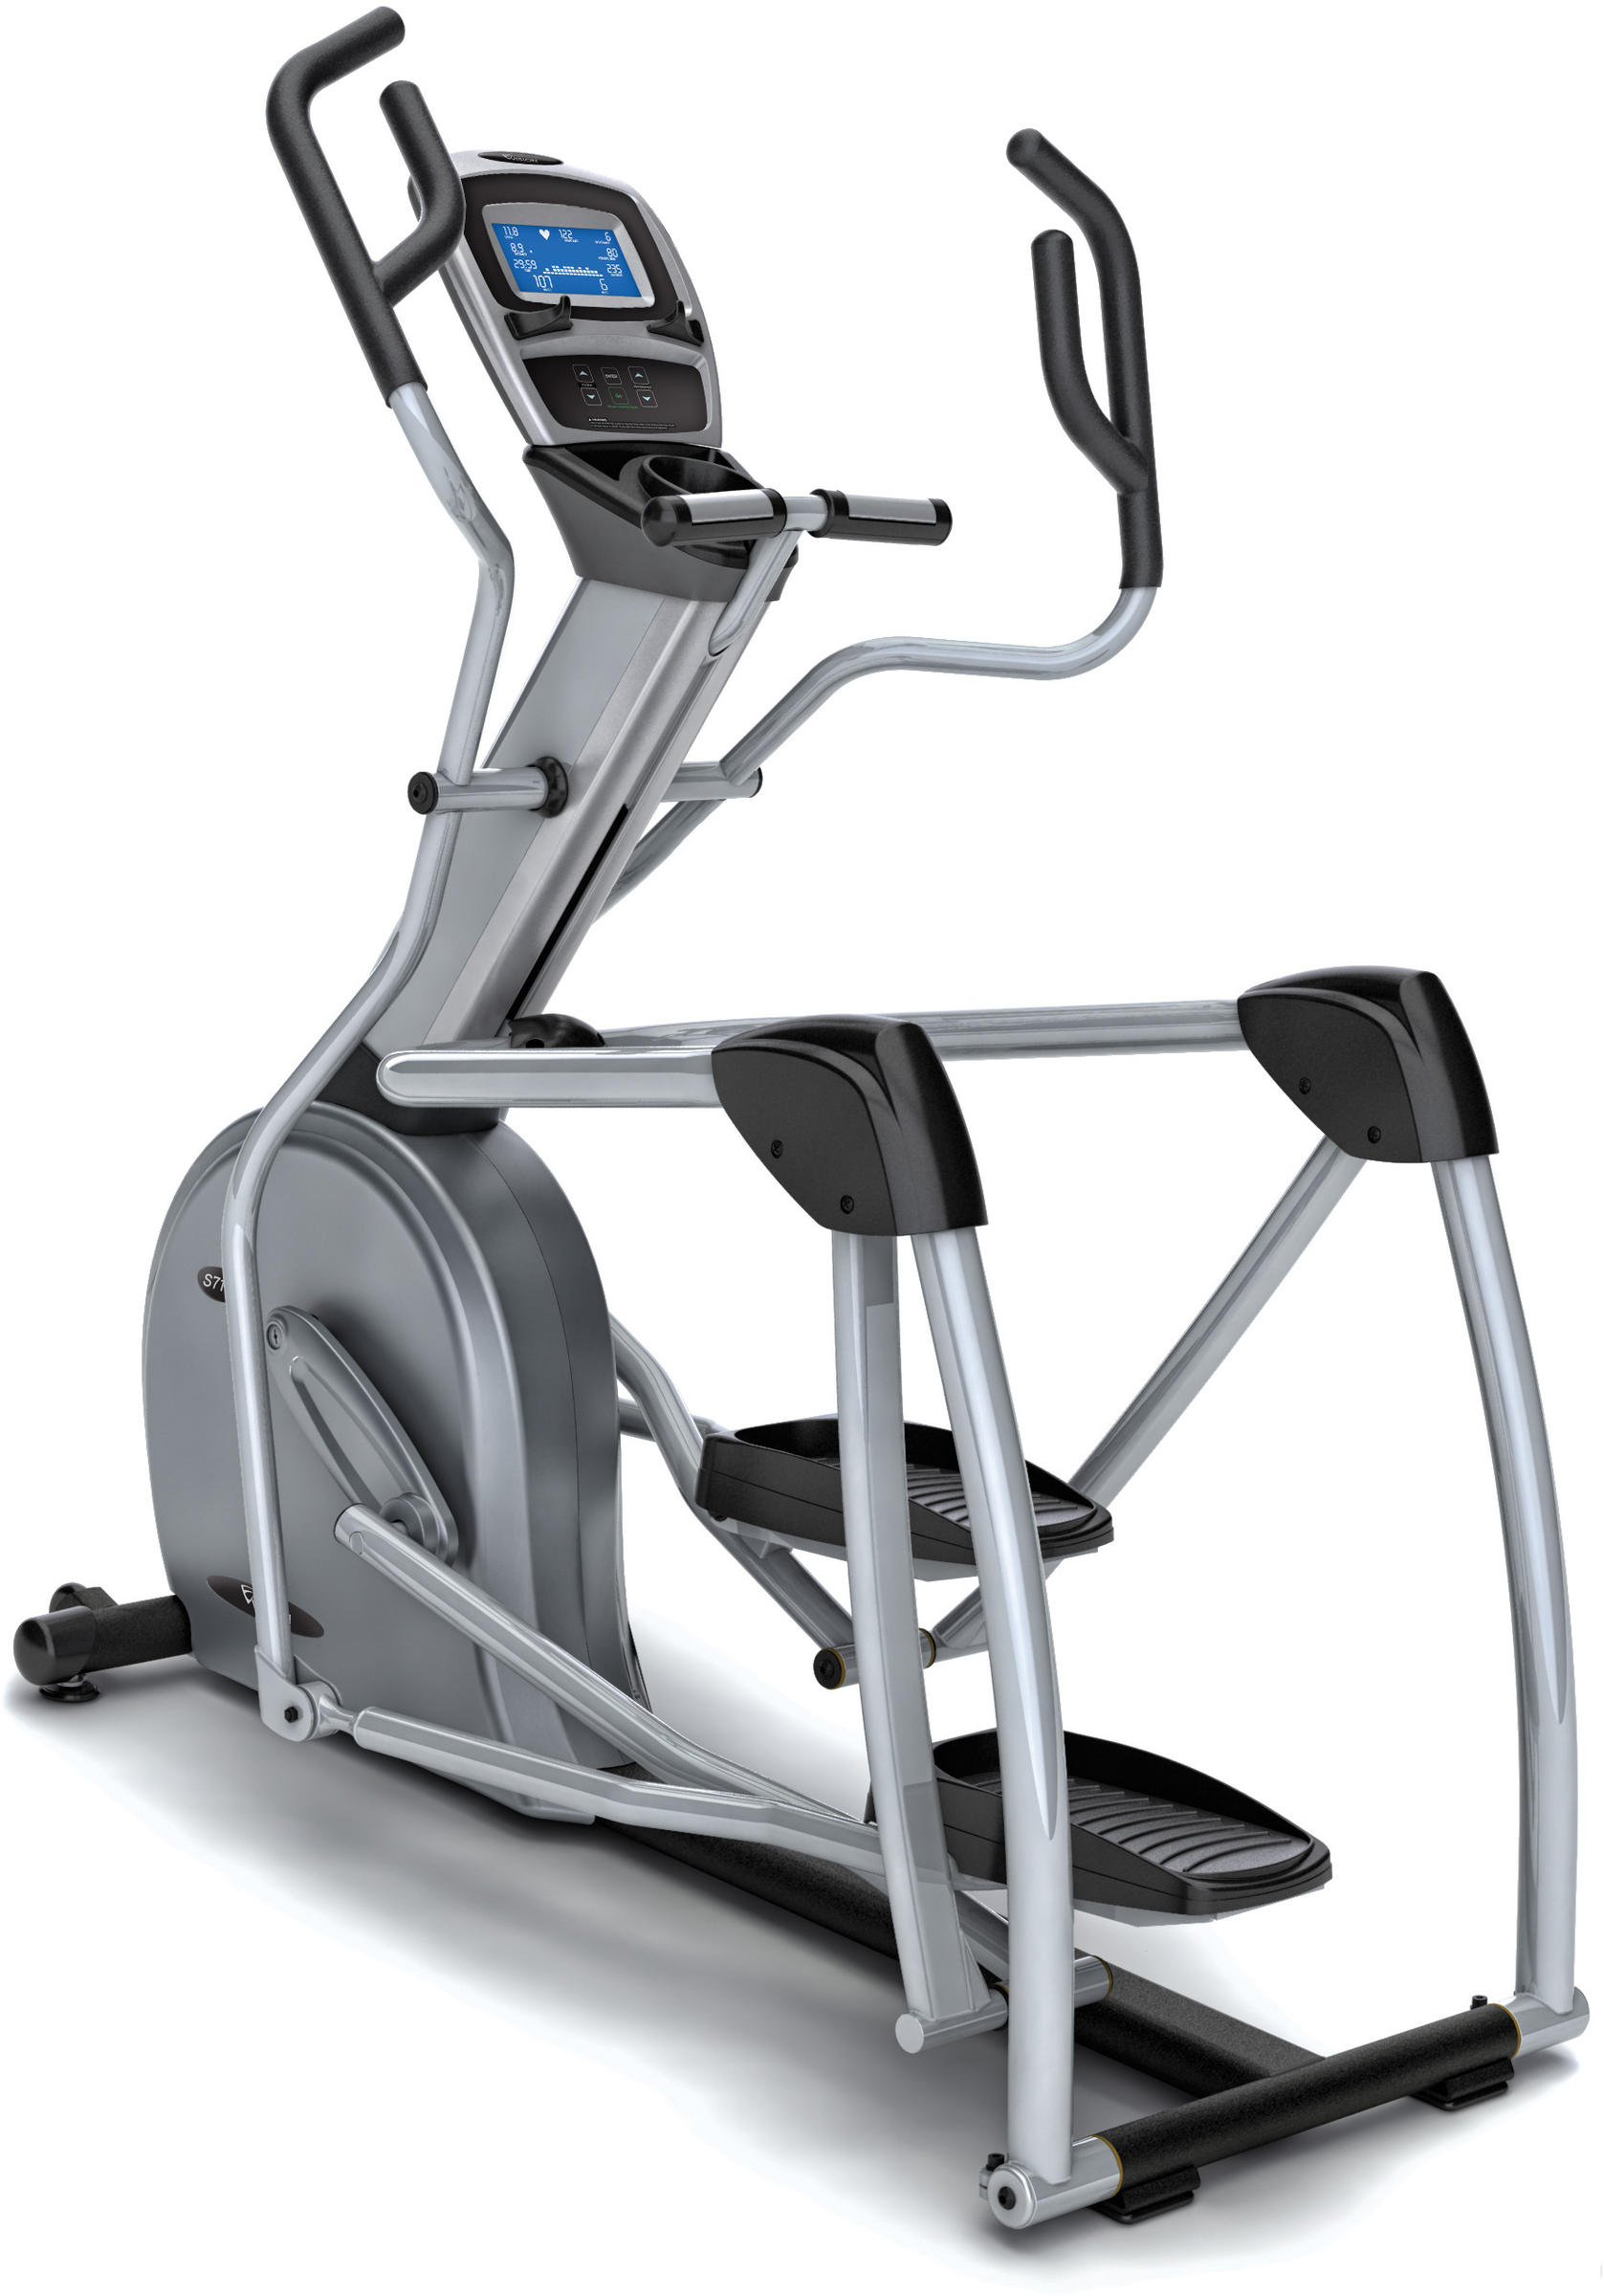 Image result for elliptical machine